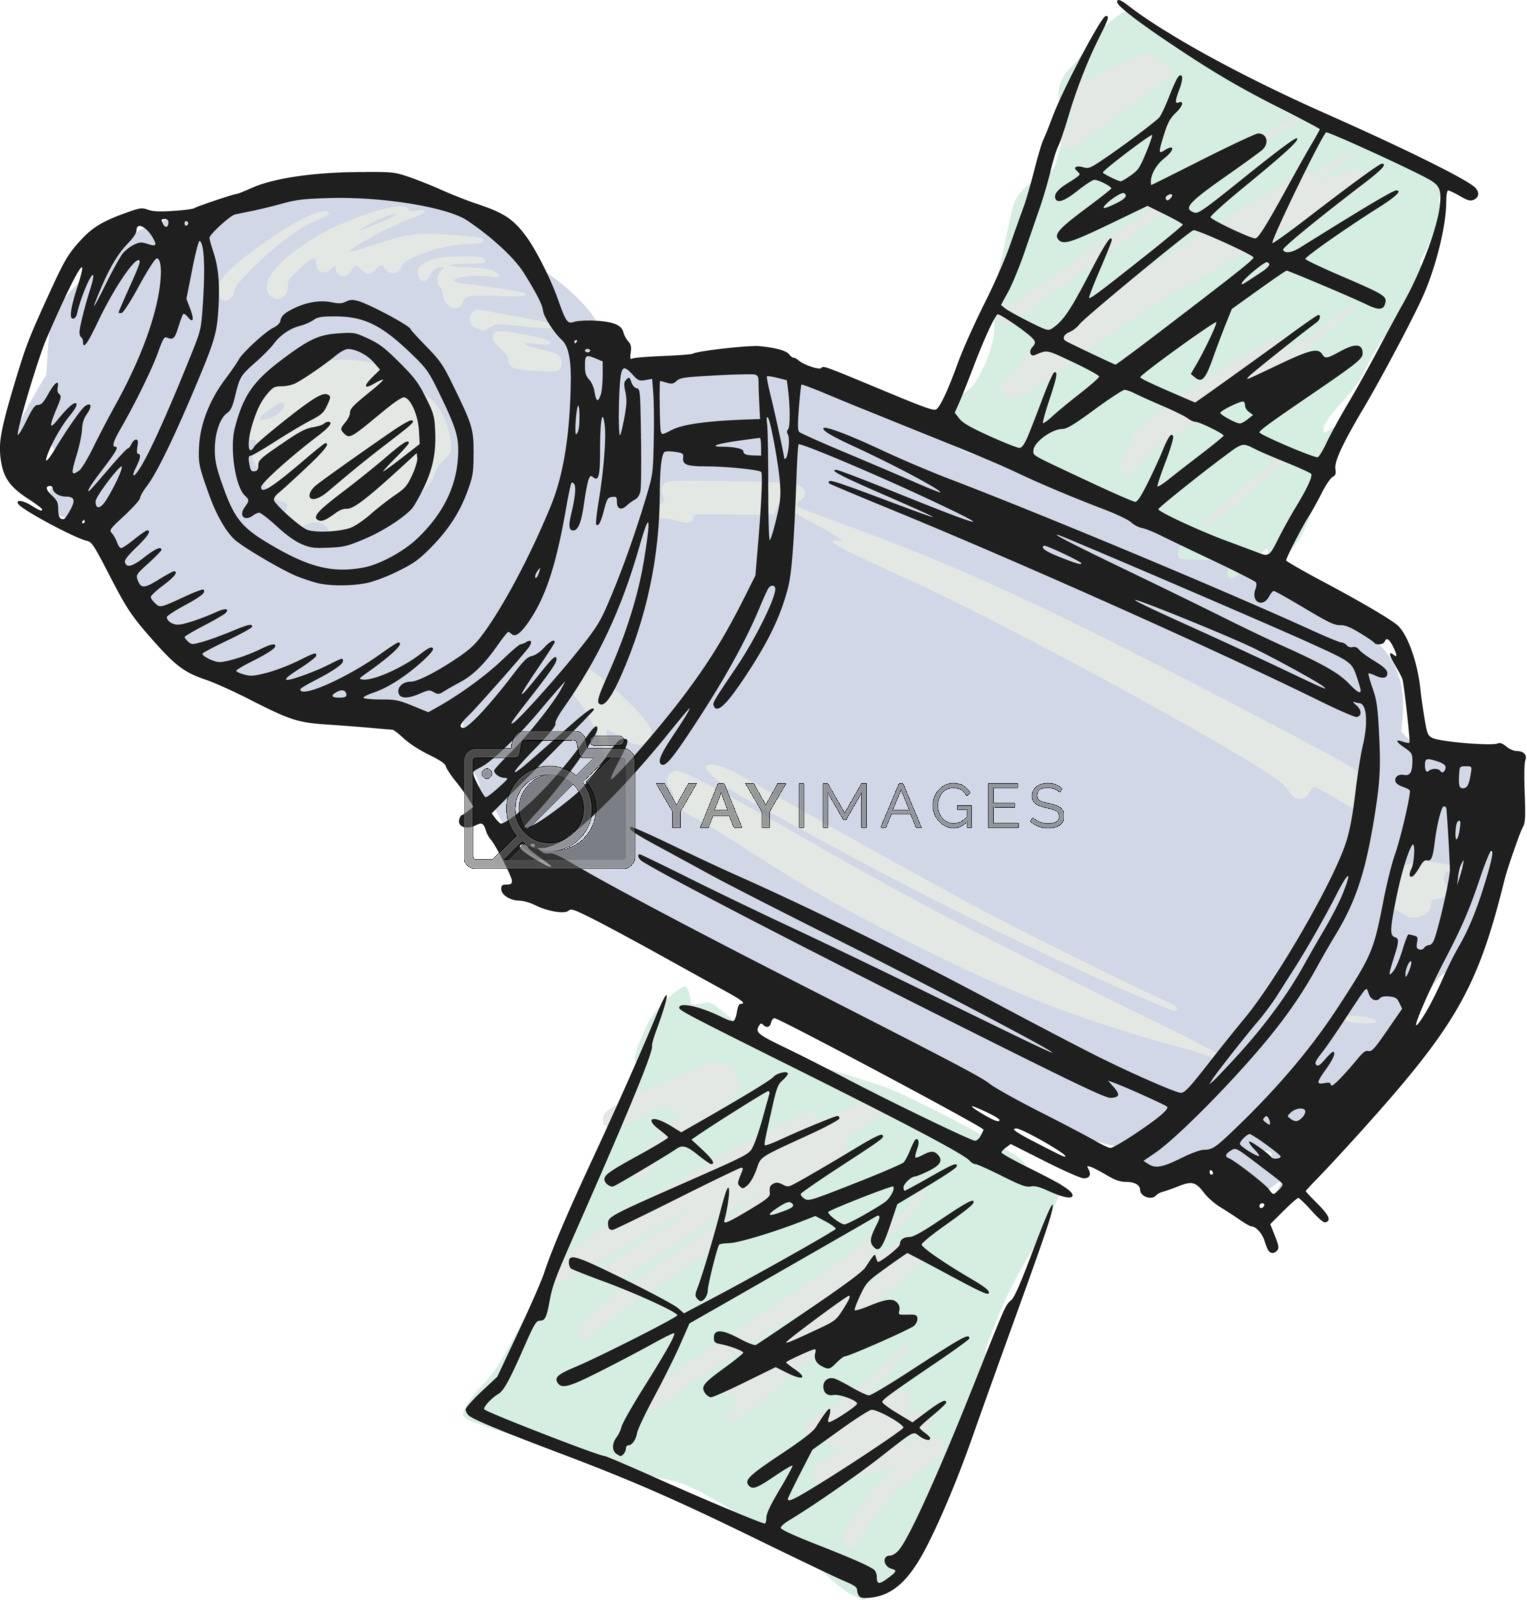 hand drawn, sketch, cartoon illustration of spacecraft